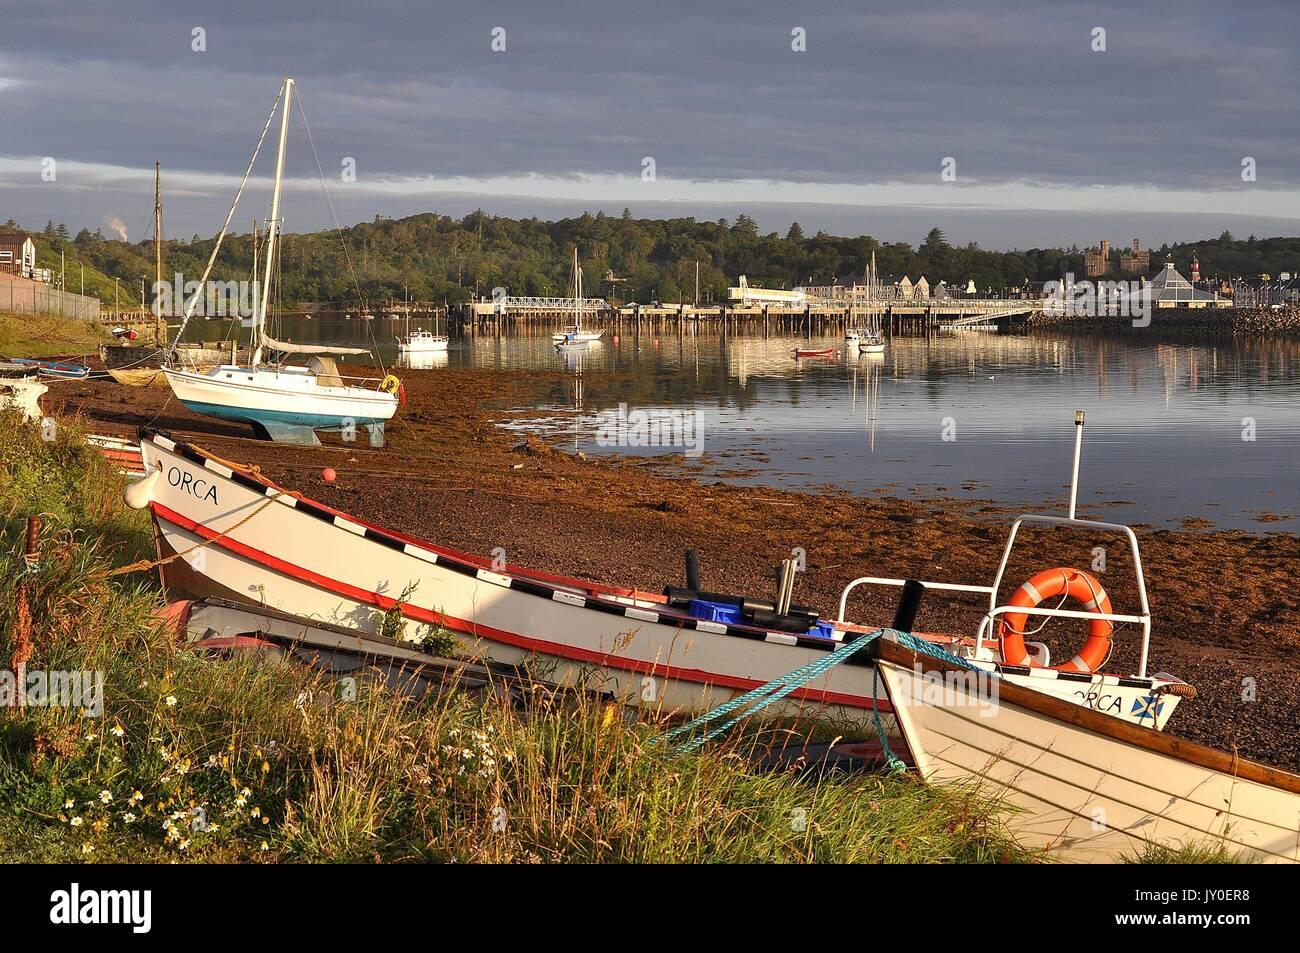 STORNOWAY HARBOUR, ISLE OF LEWIS, OUTER HEBRIDES, SCOTLAND - Stock Image